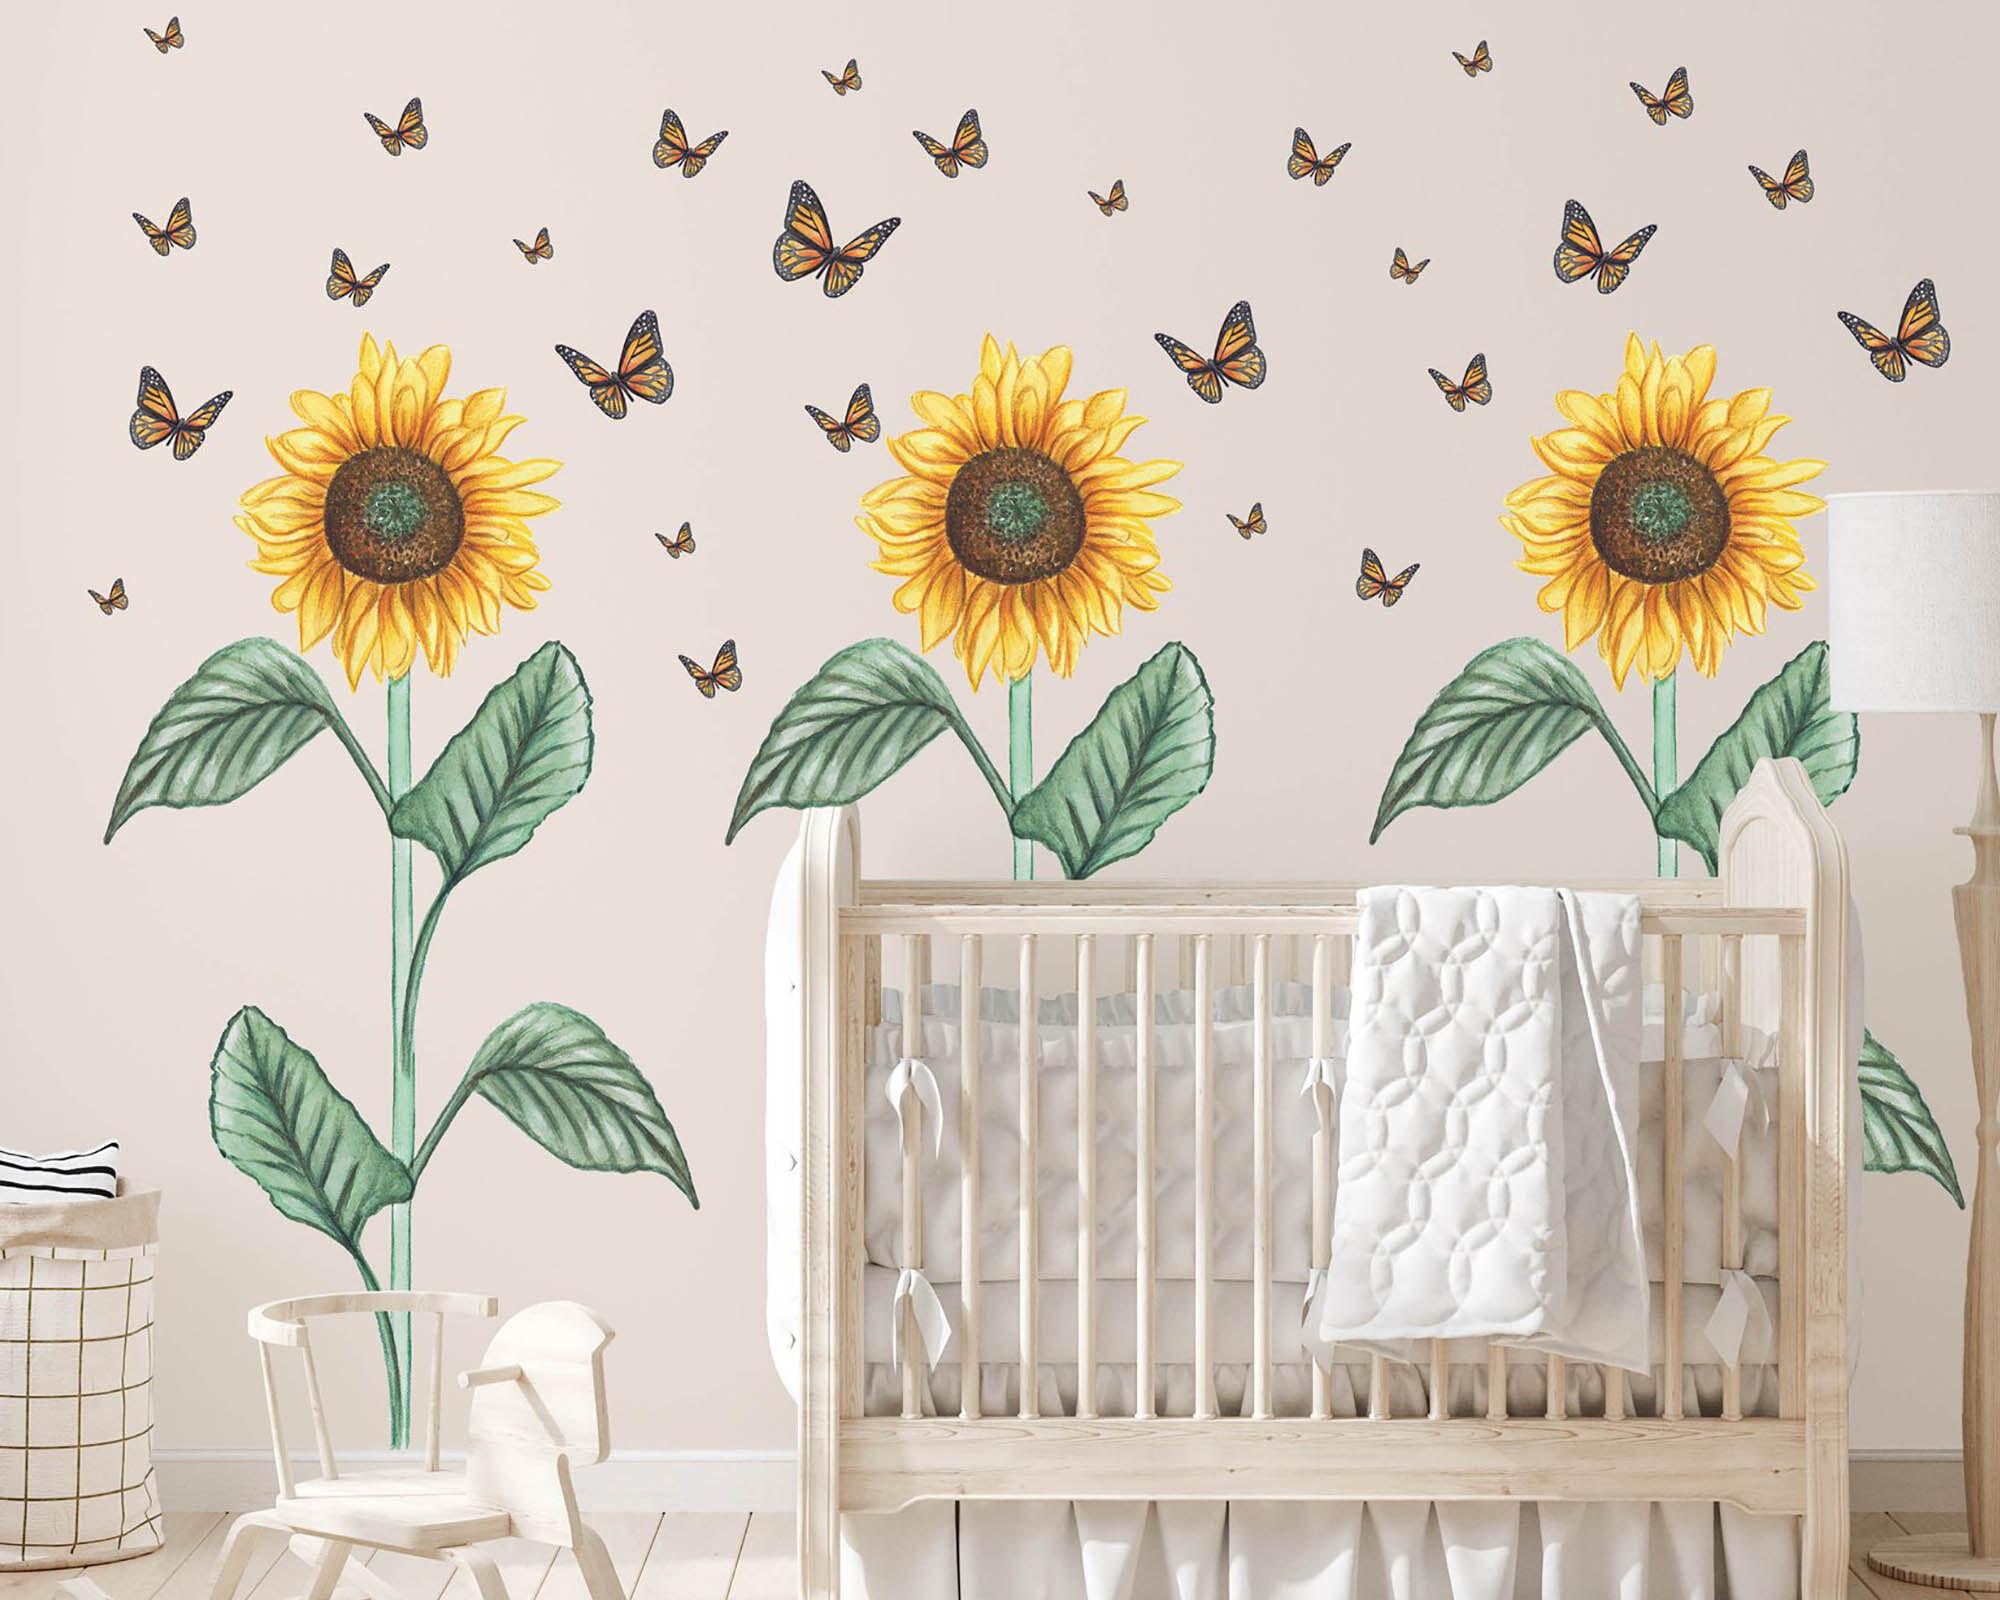 WD- Sunflowers-Main image